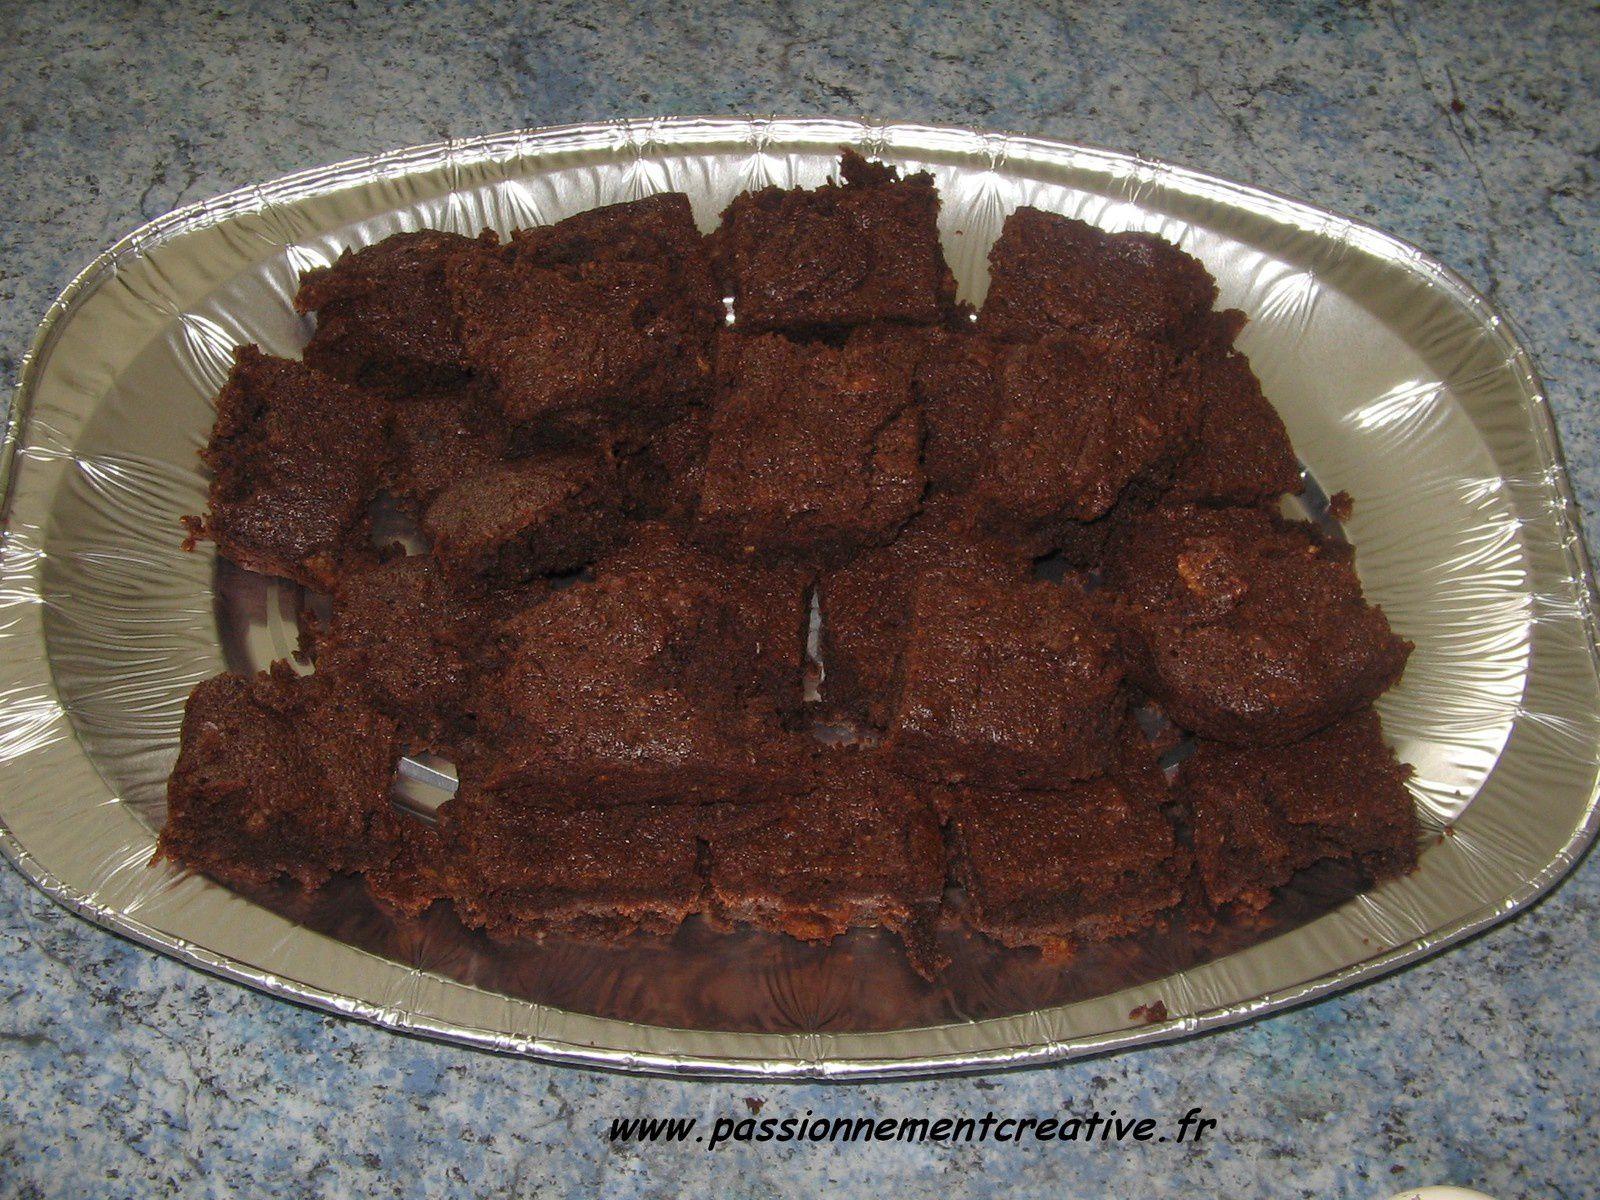 Brownie aux corn flakes